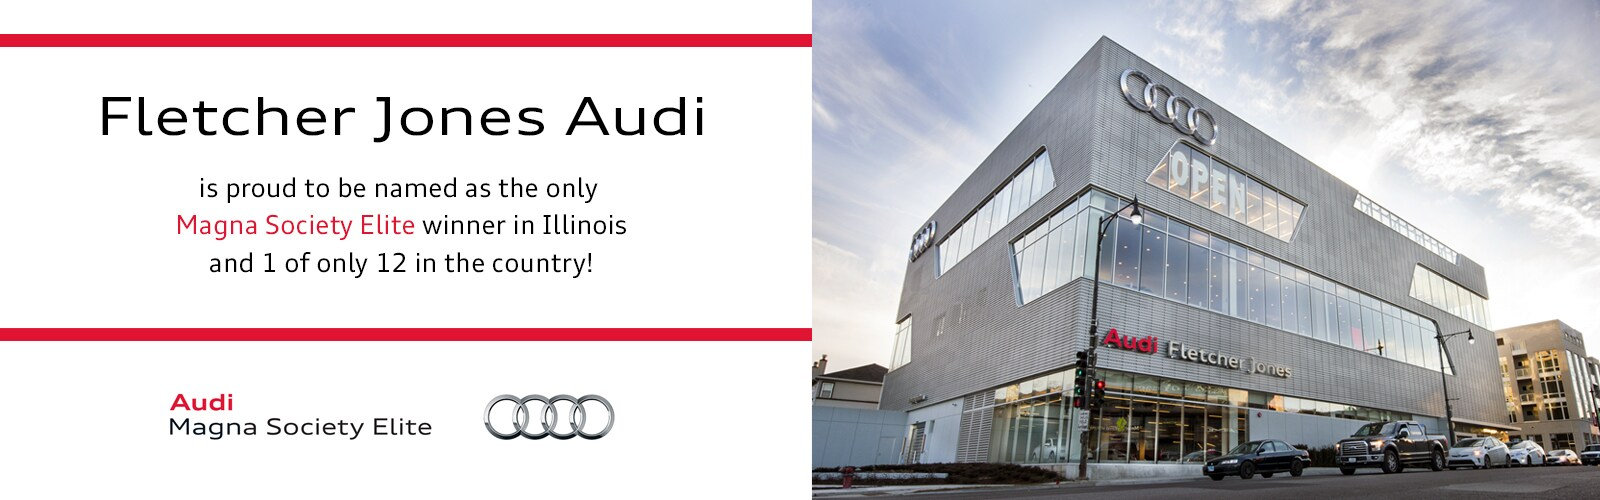 Fletcher Jones Audi Chicago  New  Used Audi Dealership in Chicago